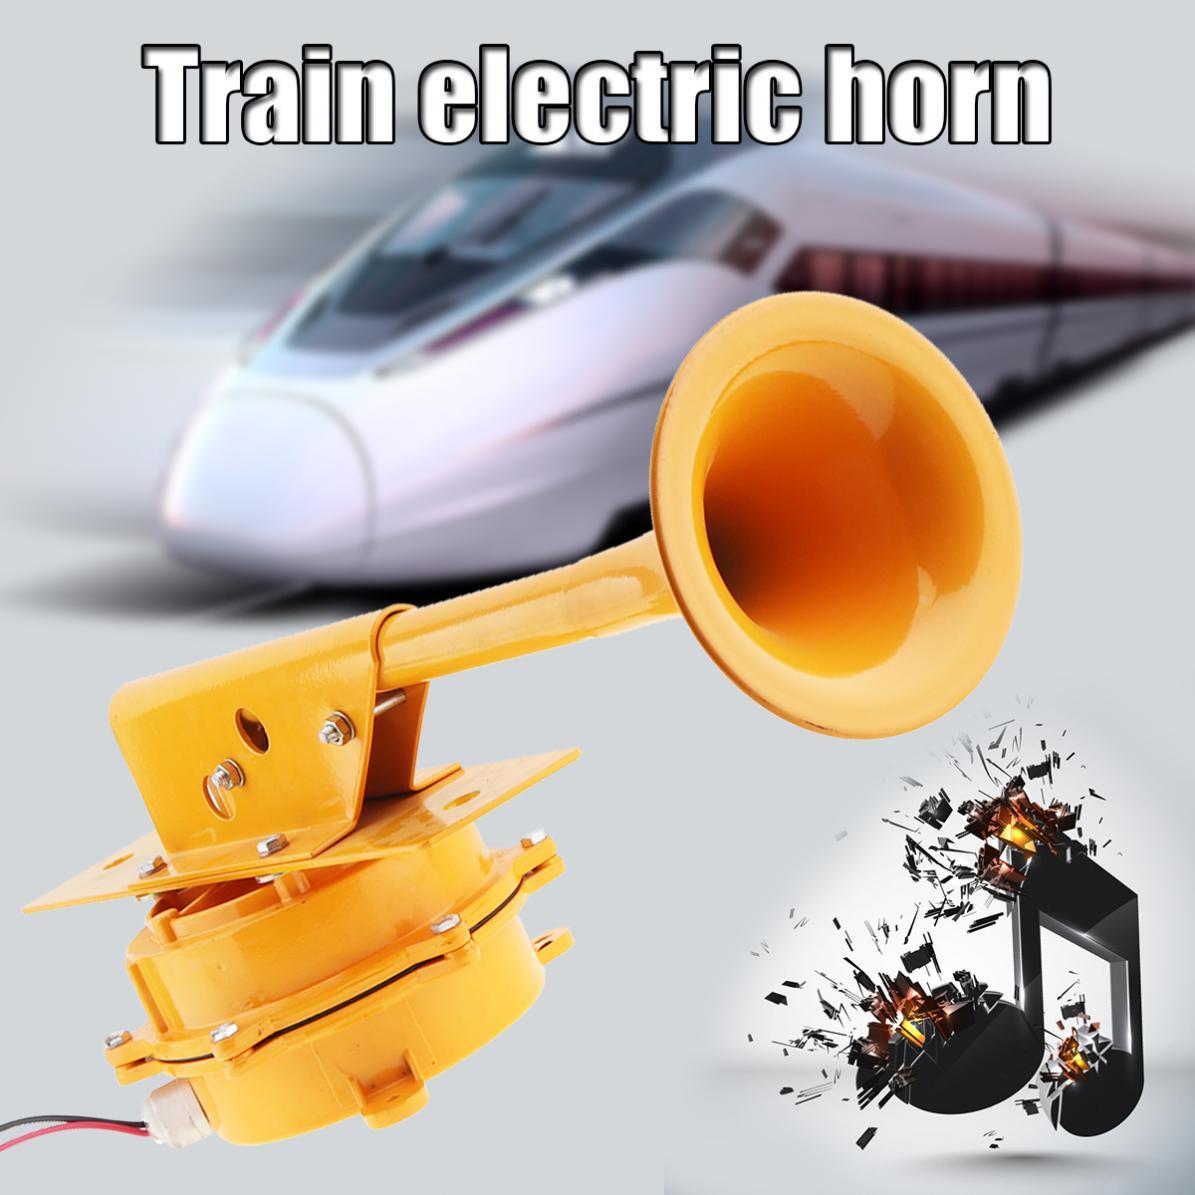 12V / 24V 1280DB Super Loud All Metal Train Horn No Need Compressor for Truck /Boat / Train /Lorry